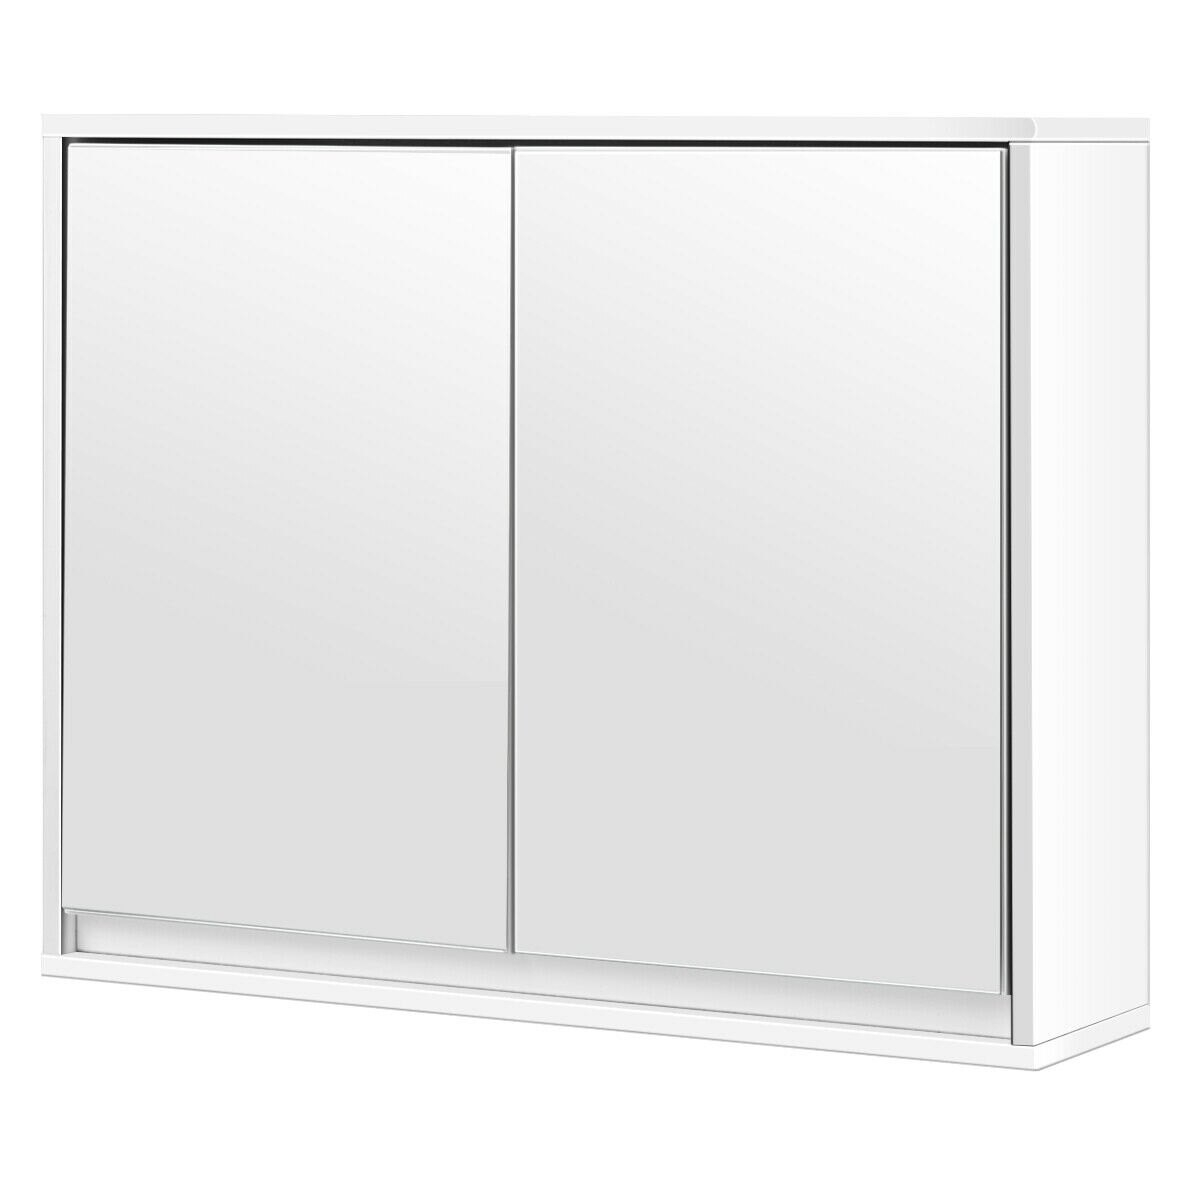 Costway Costway Wall Mounted Bathroom Storage Cabinet Double Mirror Door Organizer Shelf White Rakuten inside proportions 1200 X 1200